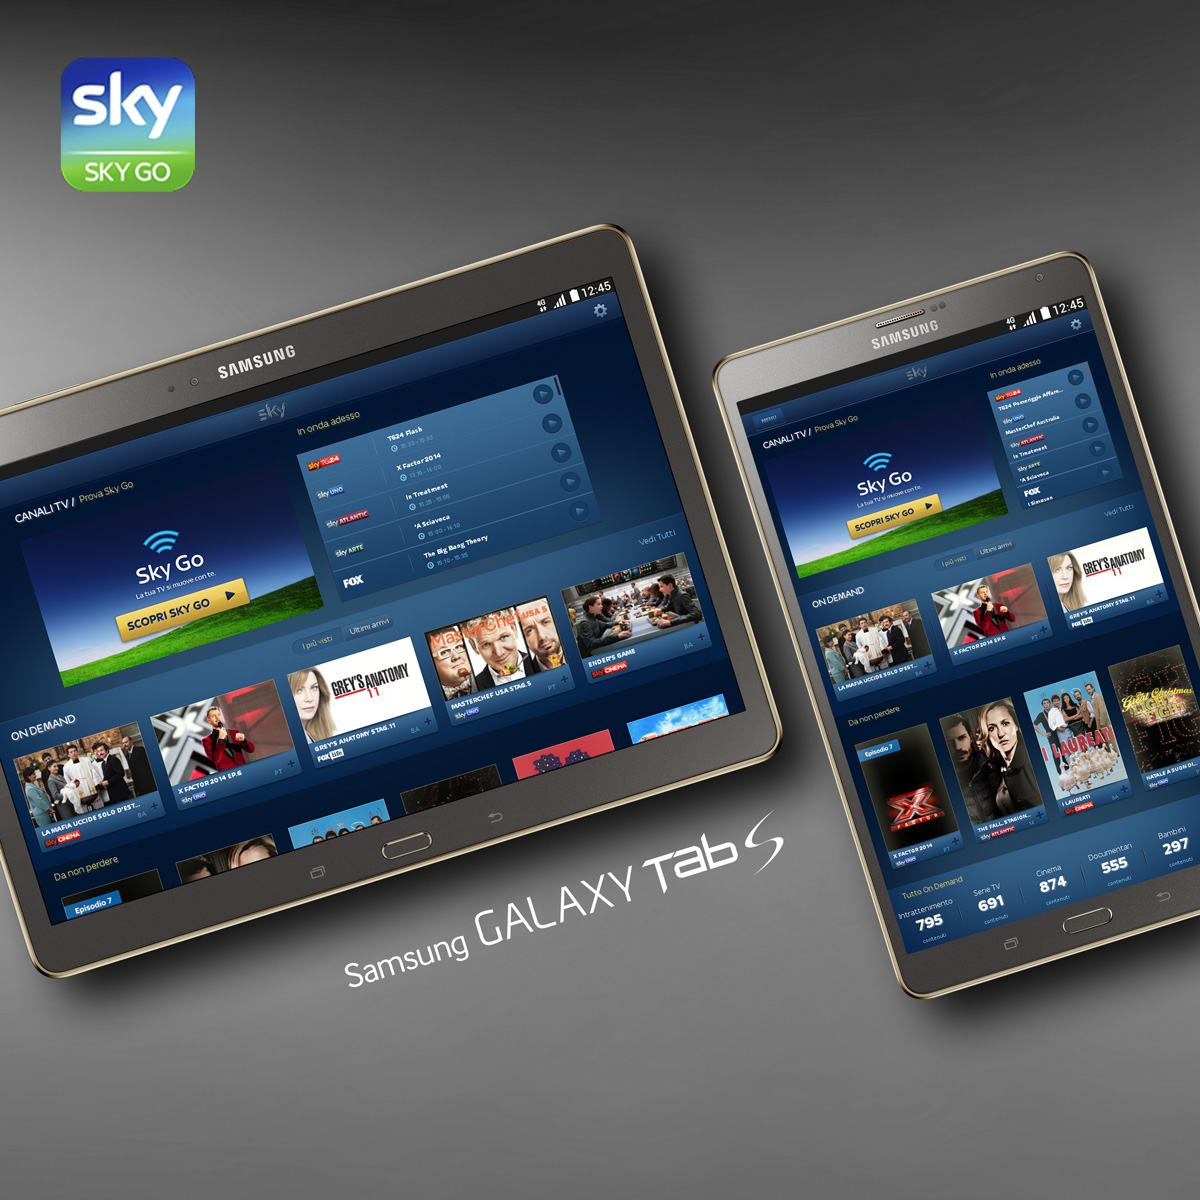 Samsung Galaxy Tab S con Sky Go